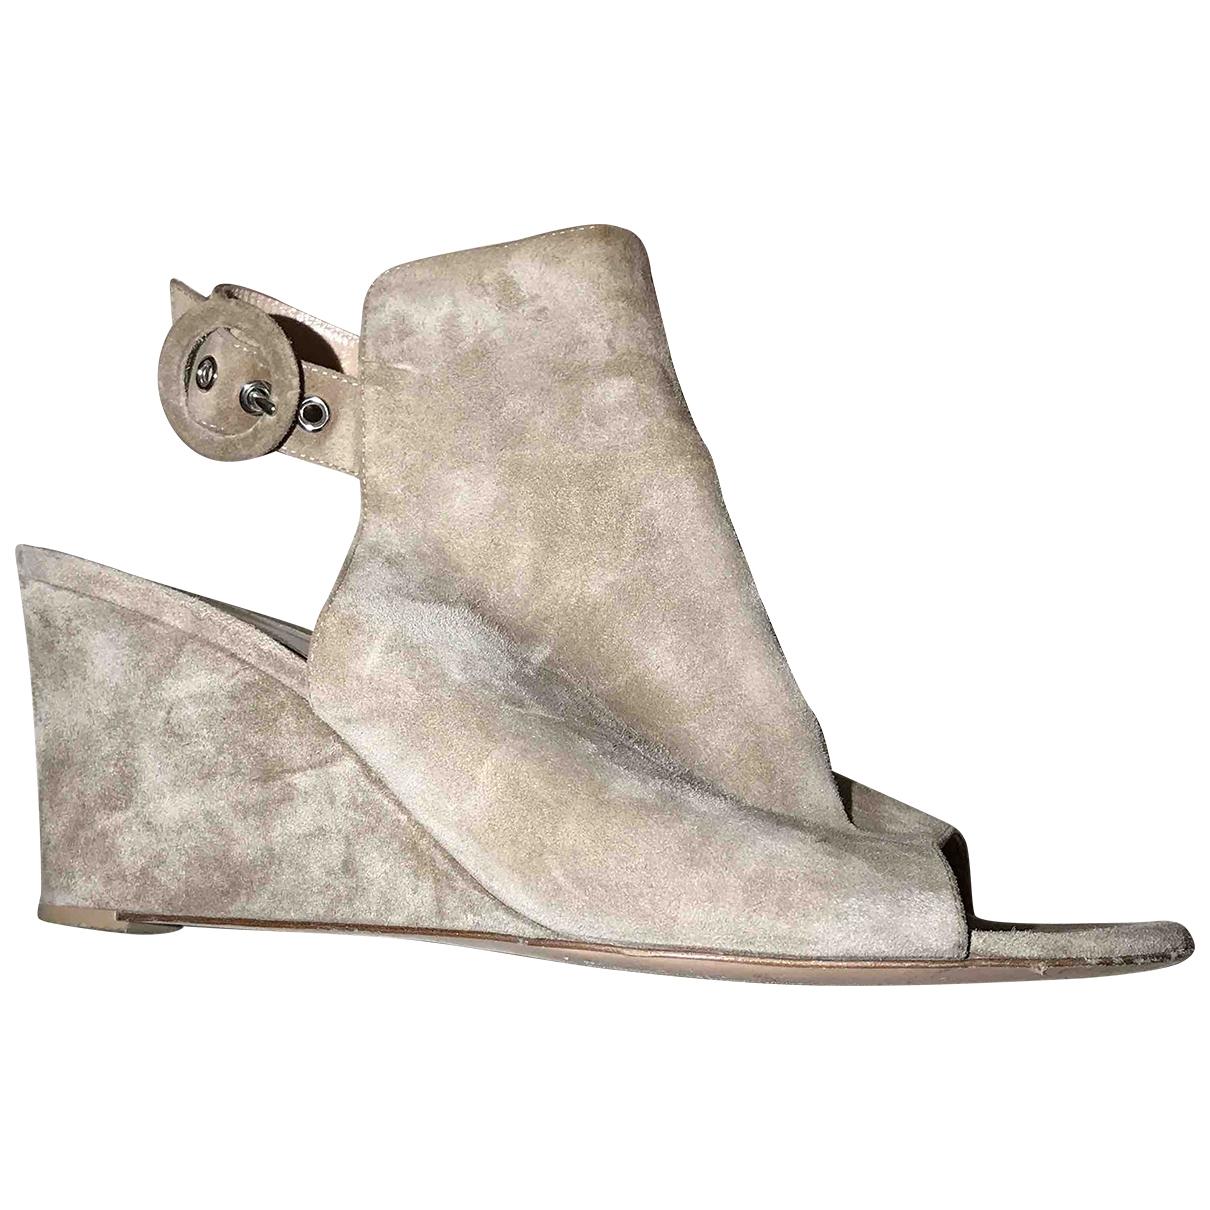 Gianvito Rossi - Sandales   pour femme en suede - beige